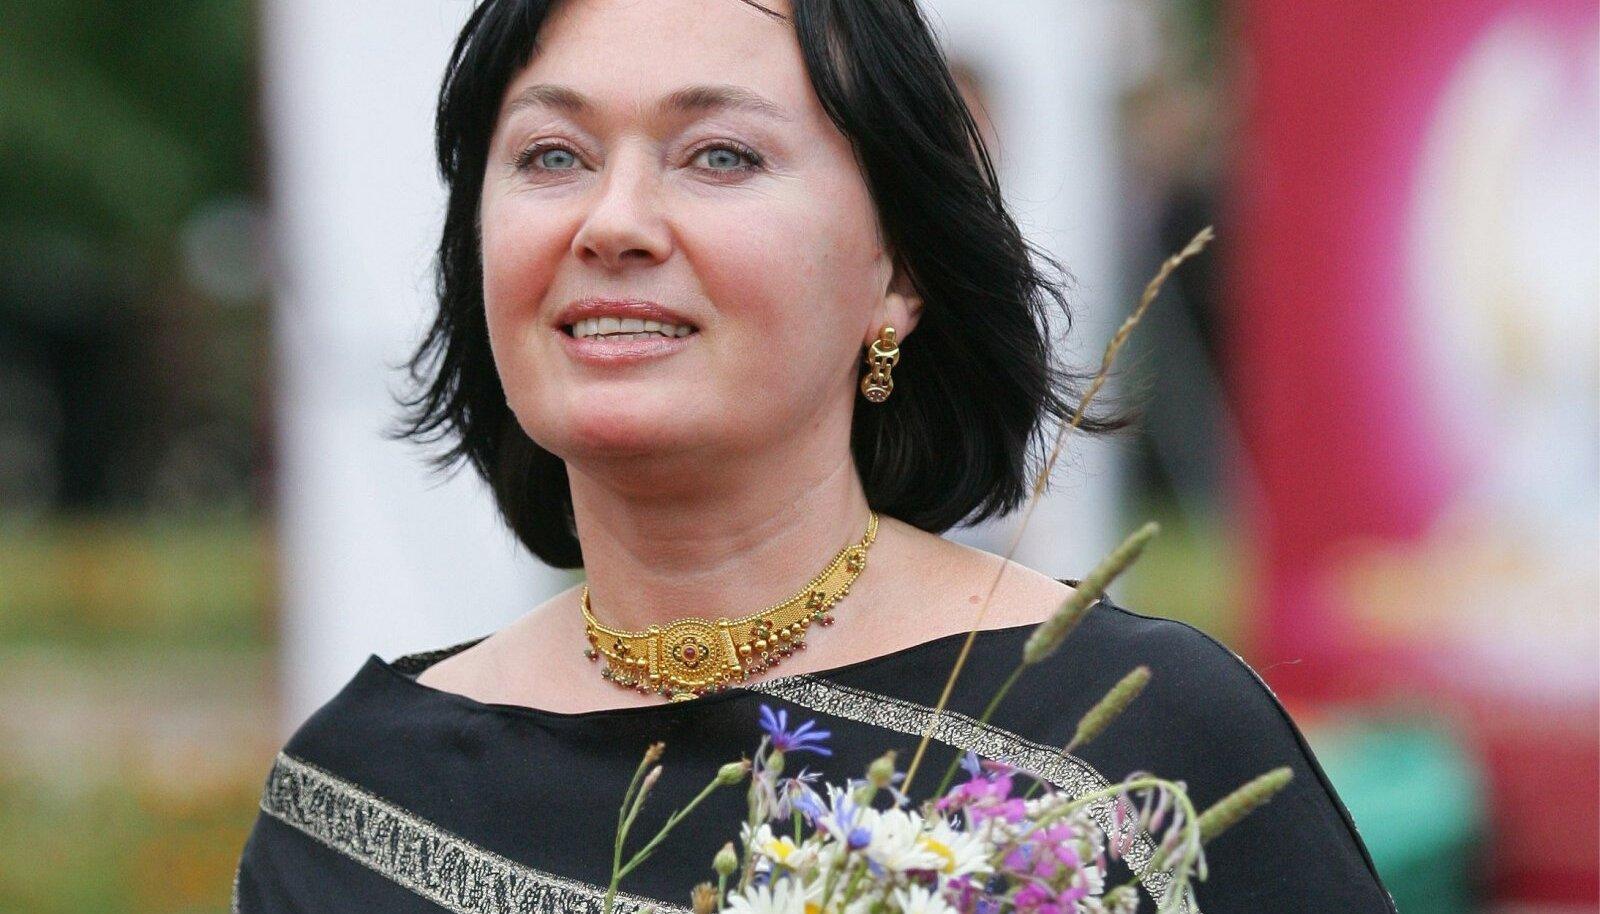 First International Intellectual Film Festival 'Mirror' opens in Ivanovo